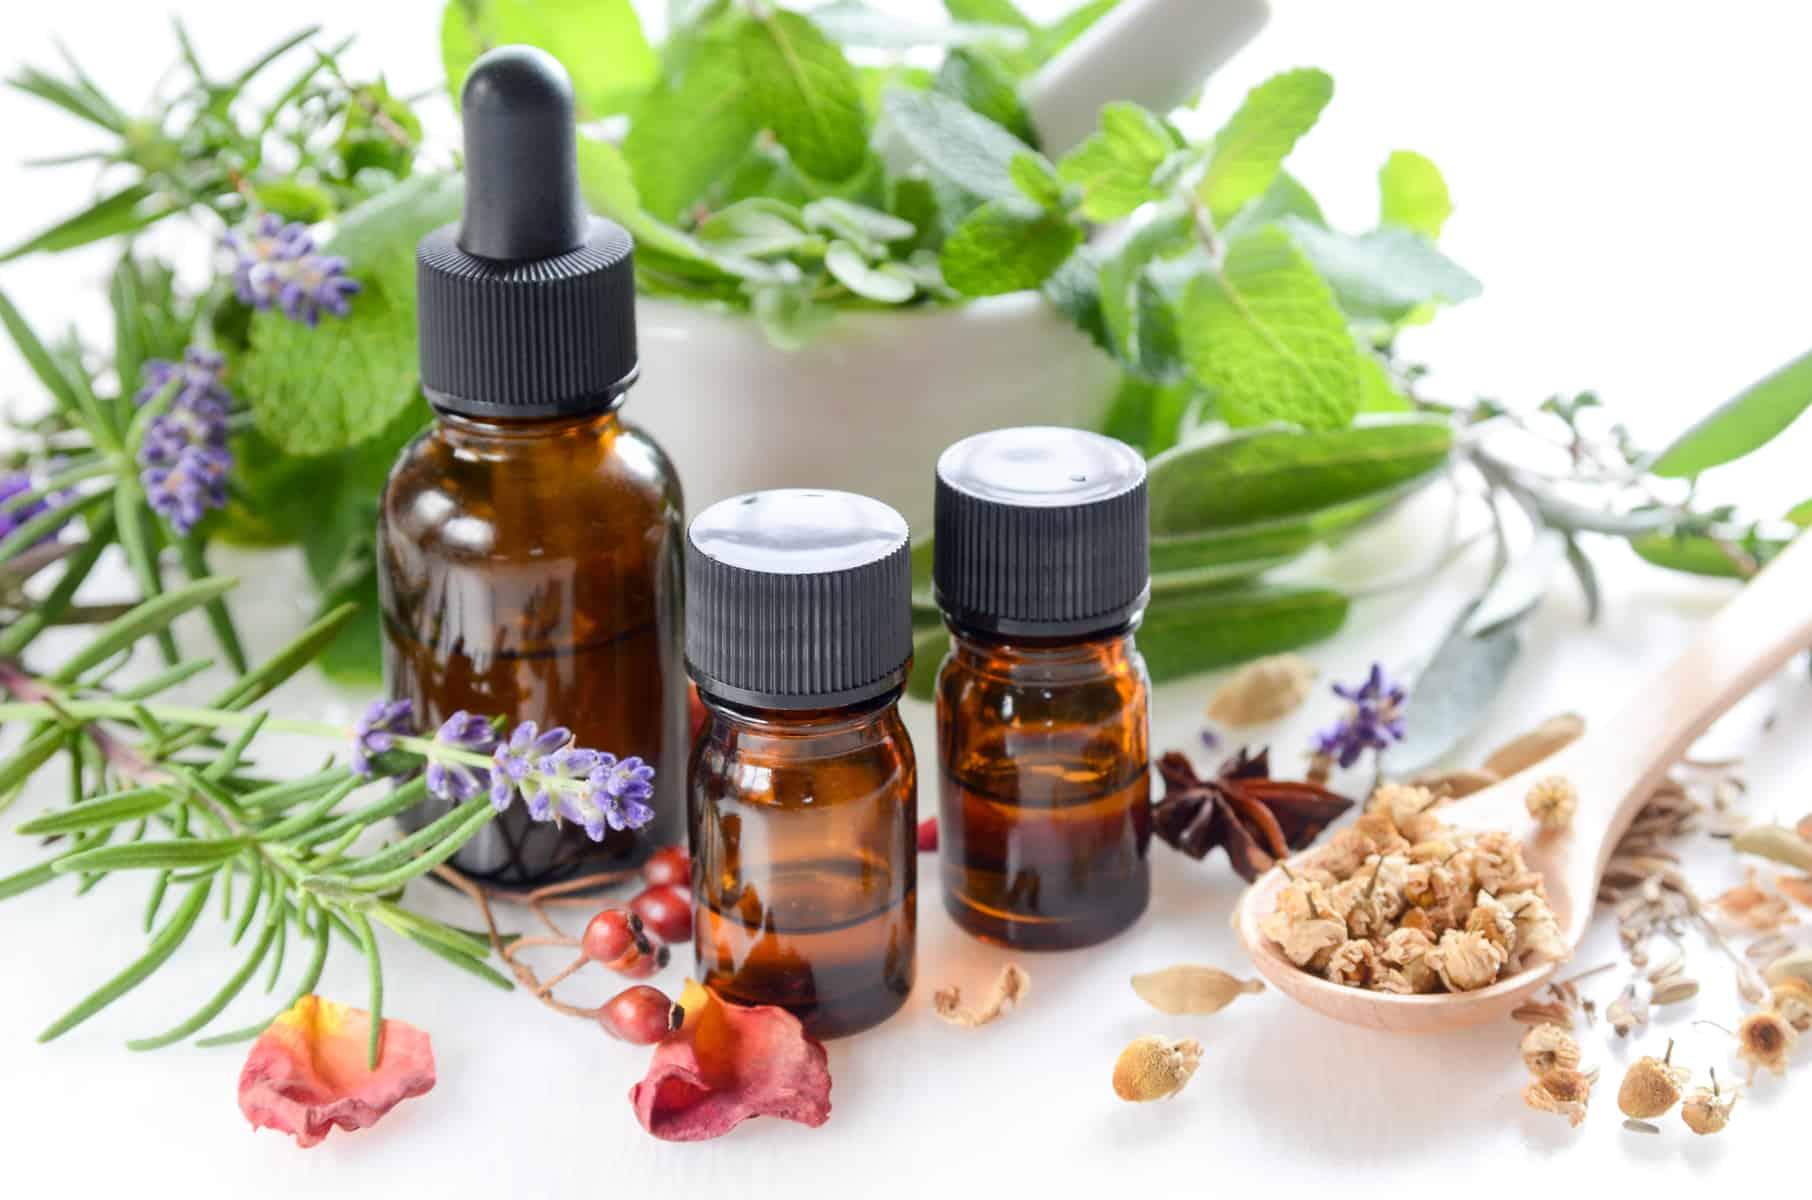 Just Natural Essential Oils